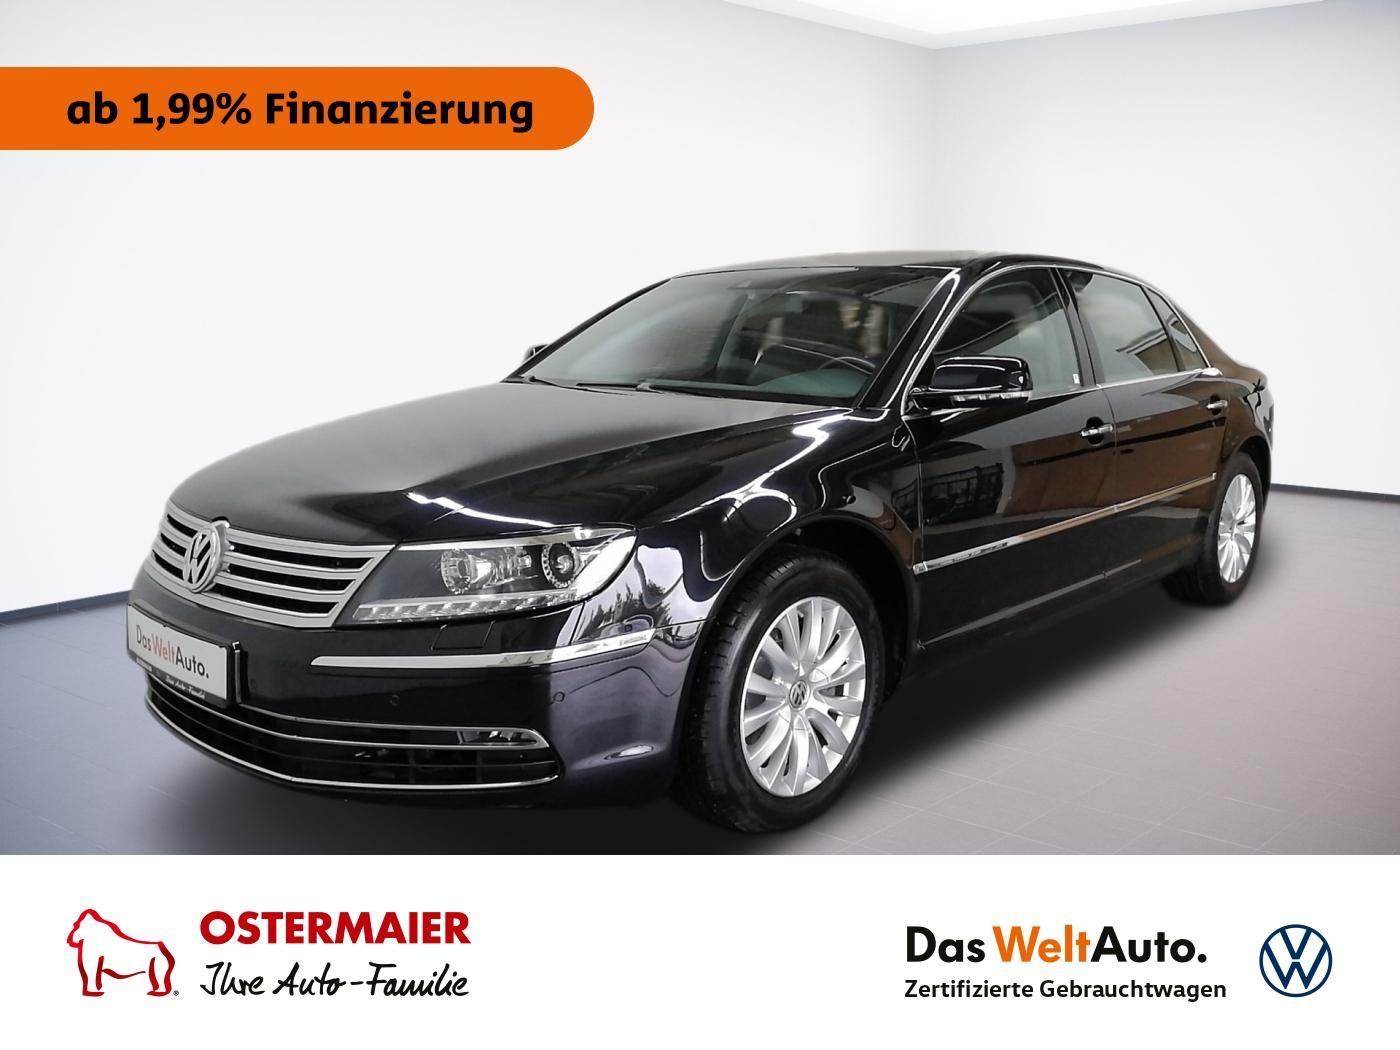 Volkswagen Phaeton lang 3.0TDI 245PS DSG 4M LUFT.NAVI.PDC.P, Jahr 2015, Diesel